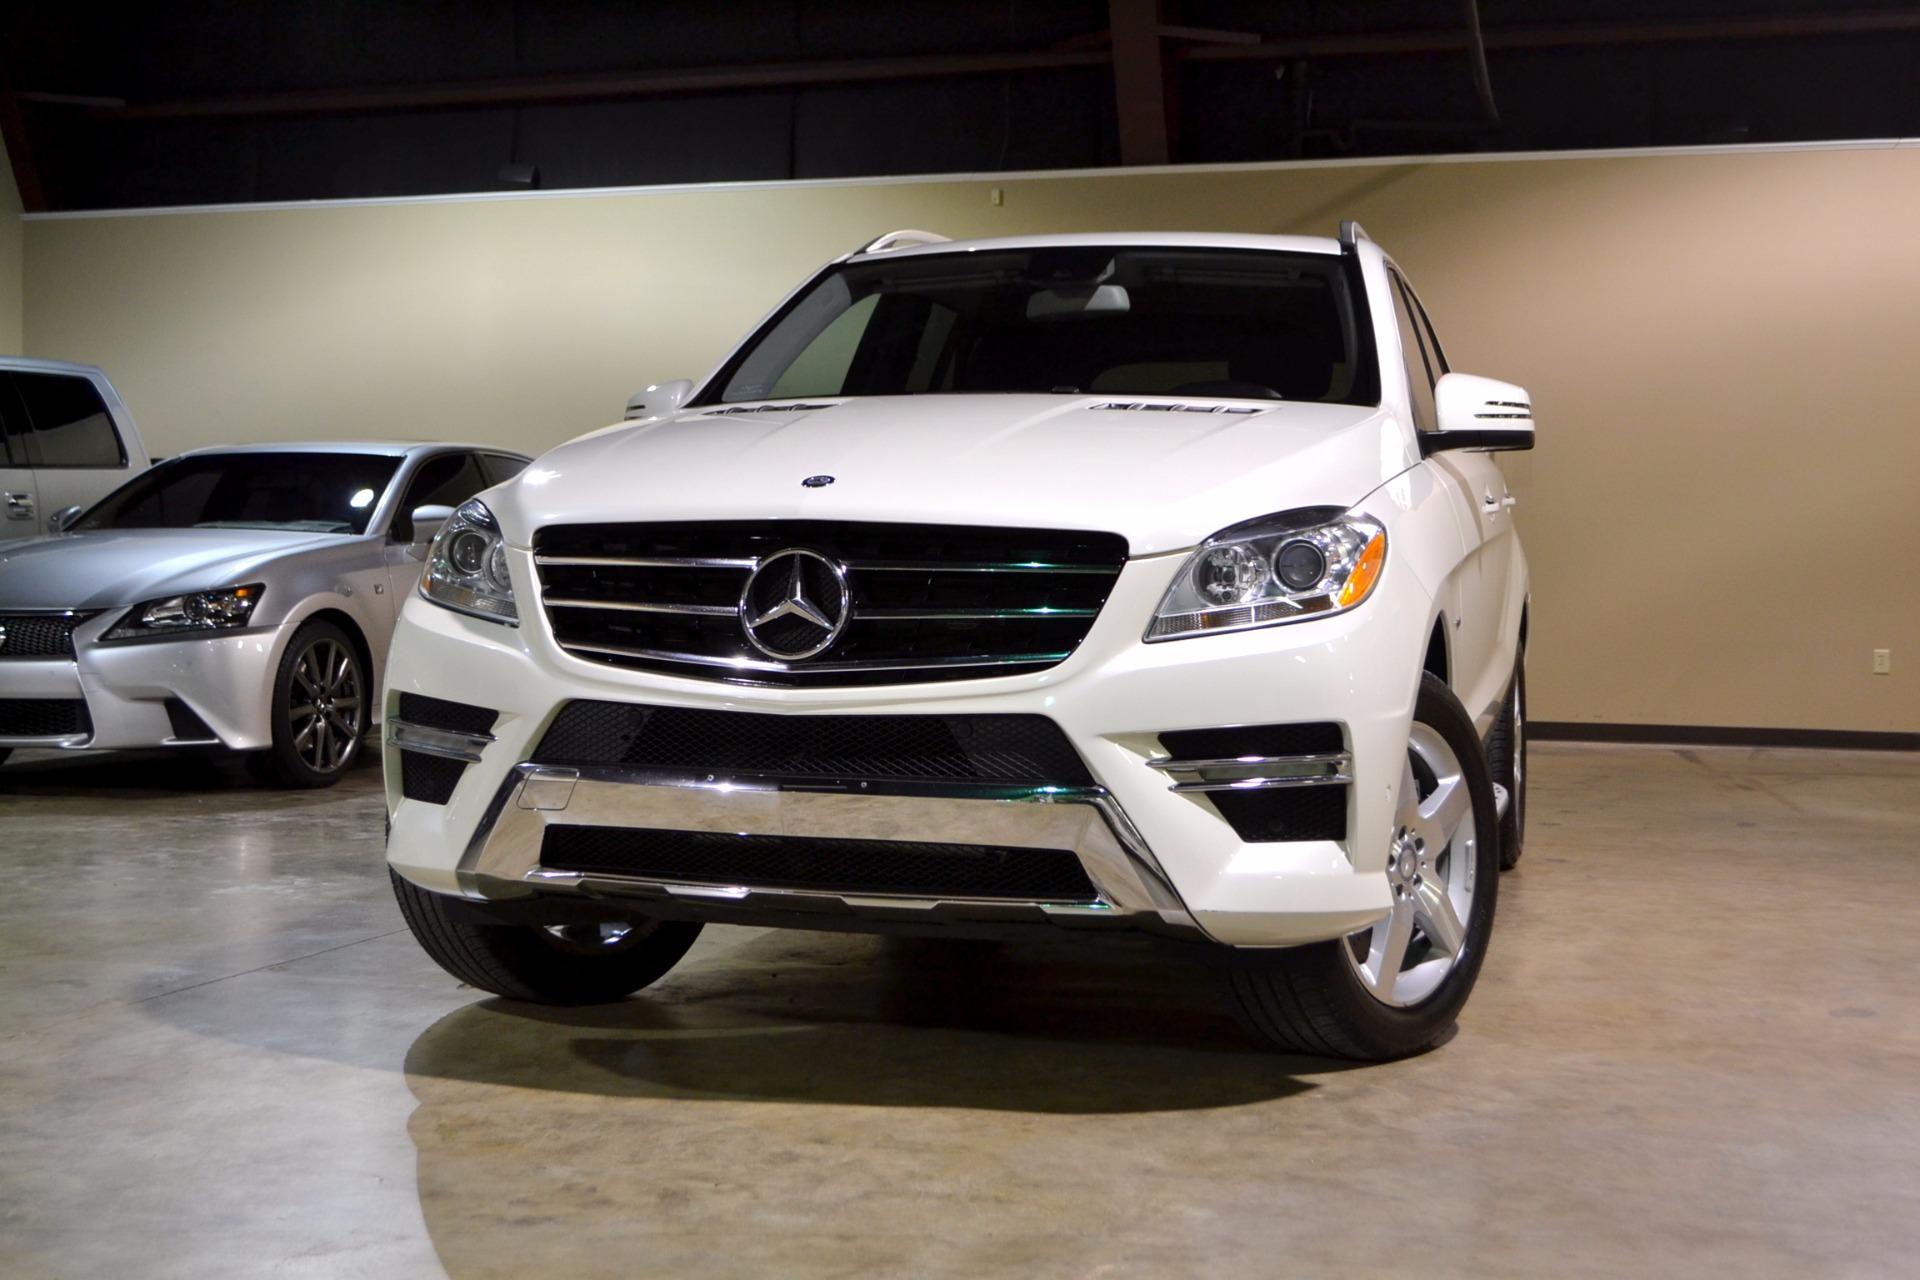 2012 mercedes benz ml550 sport for Mercedes benz ml550 price